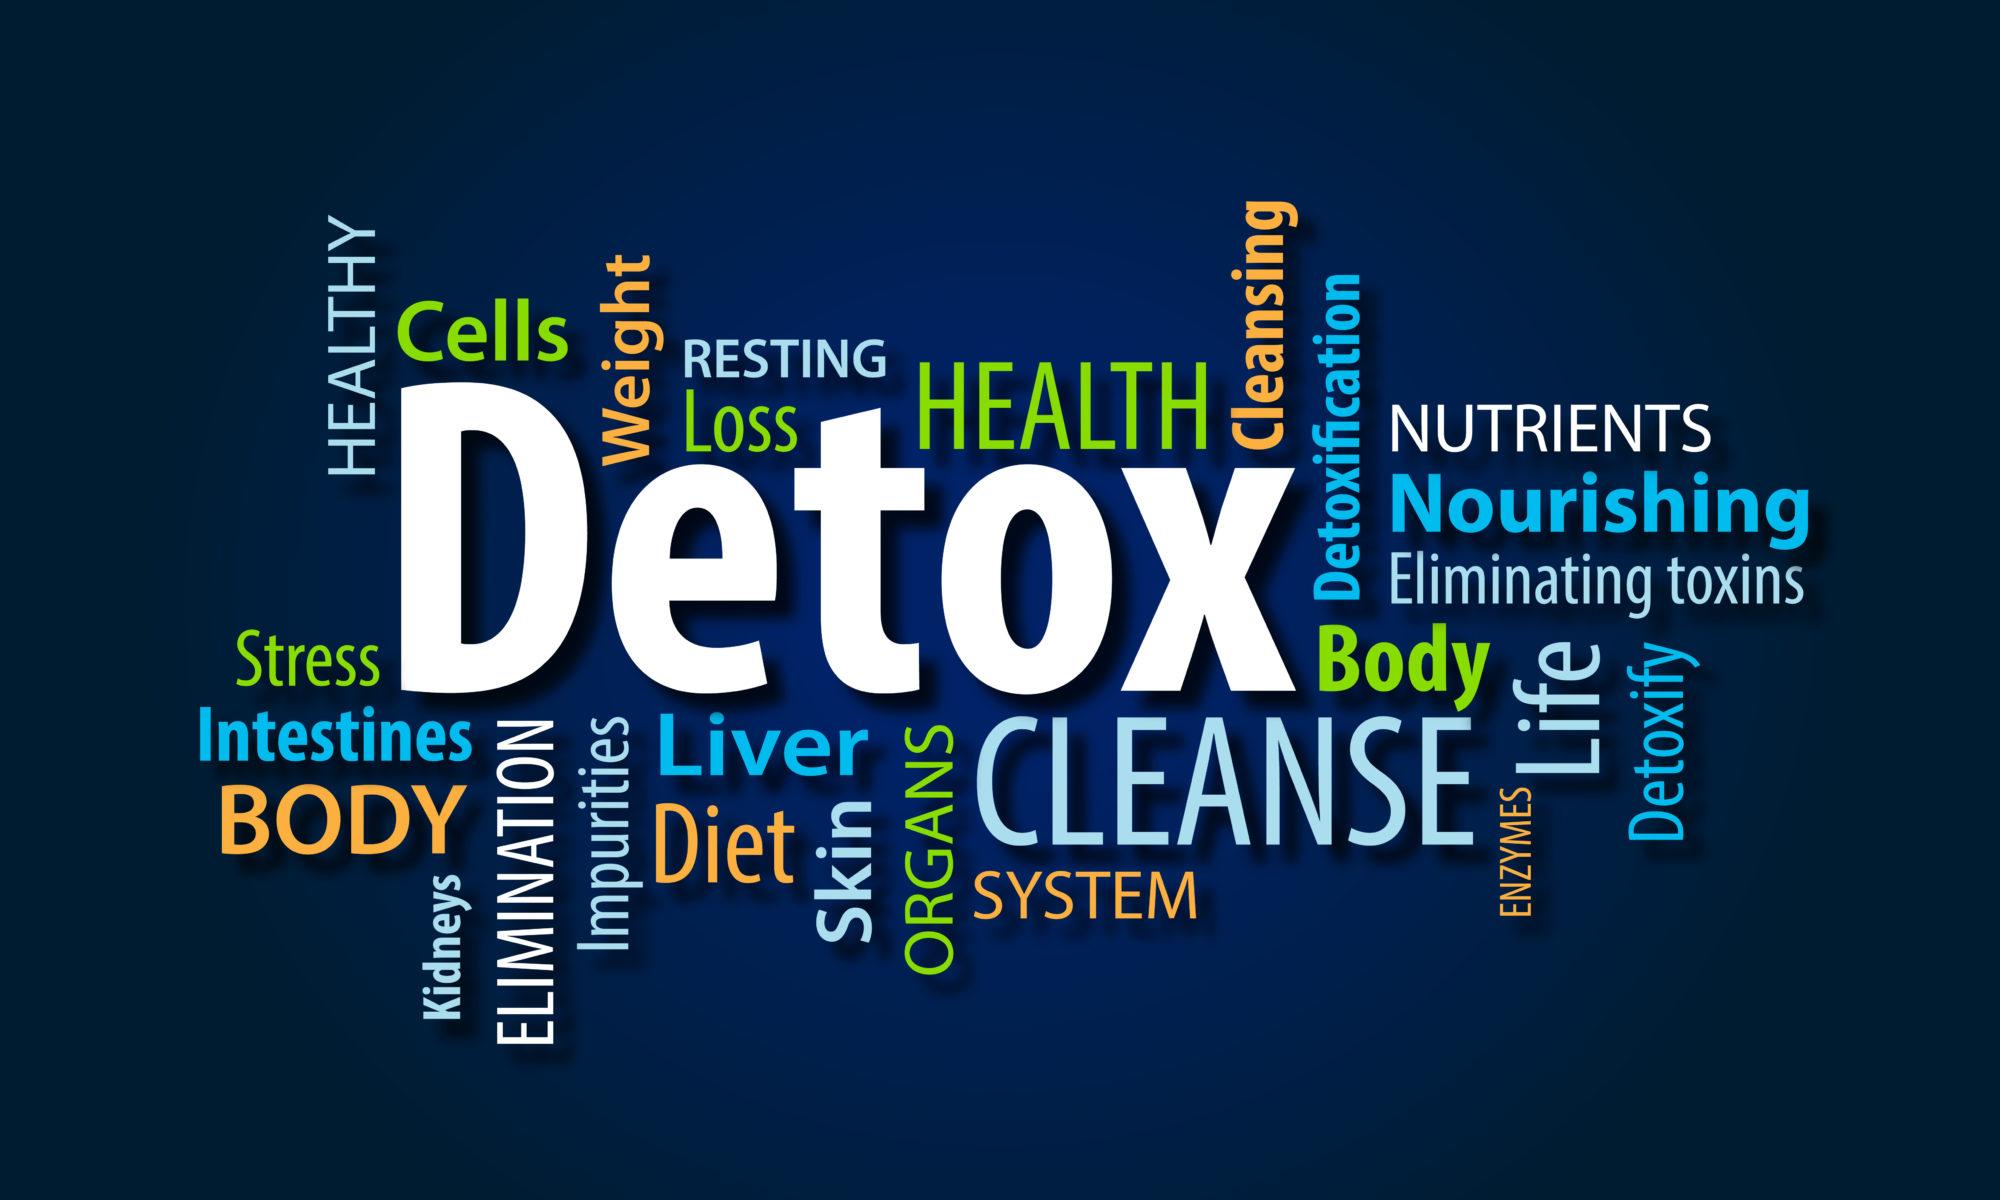 Liver Cleanse Detox